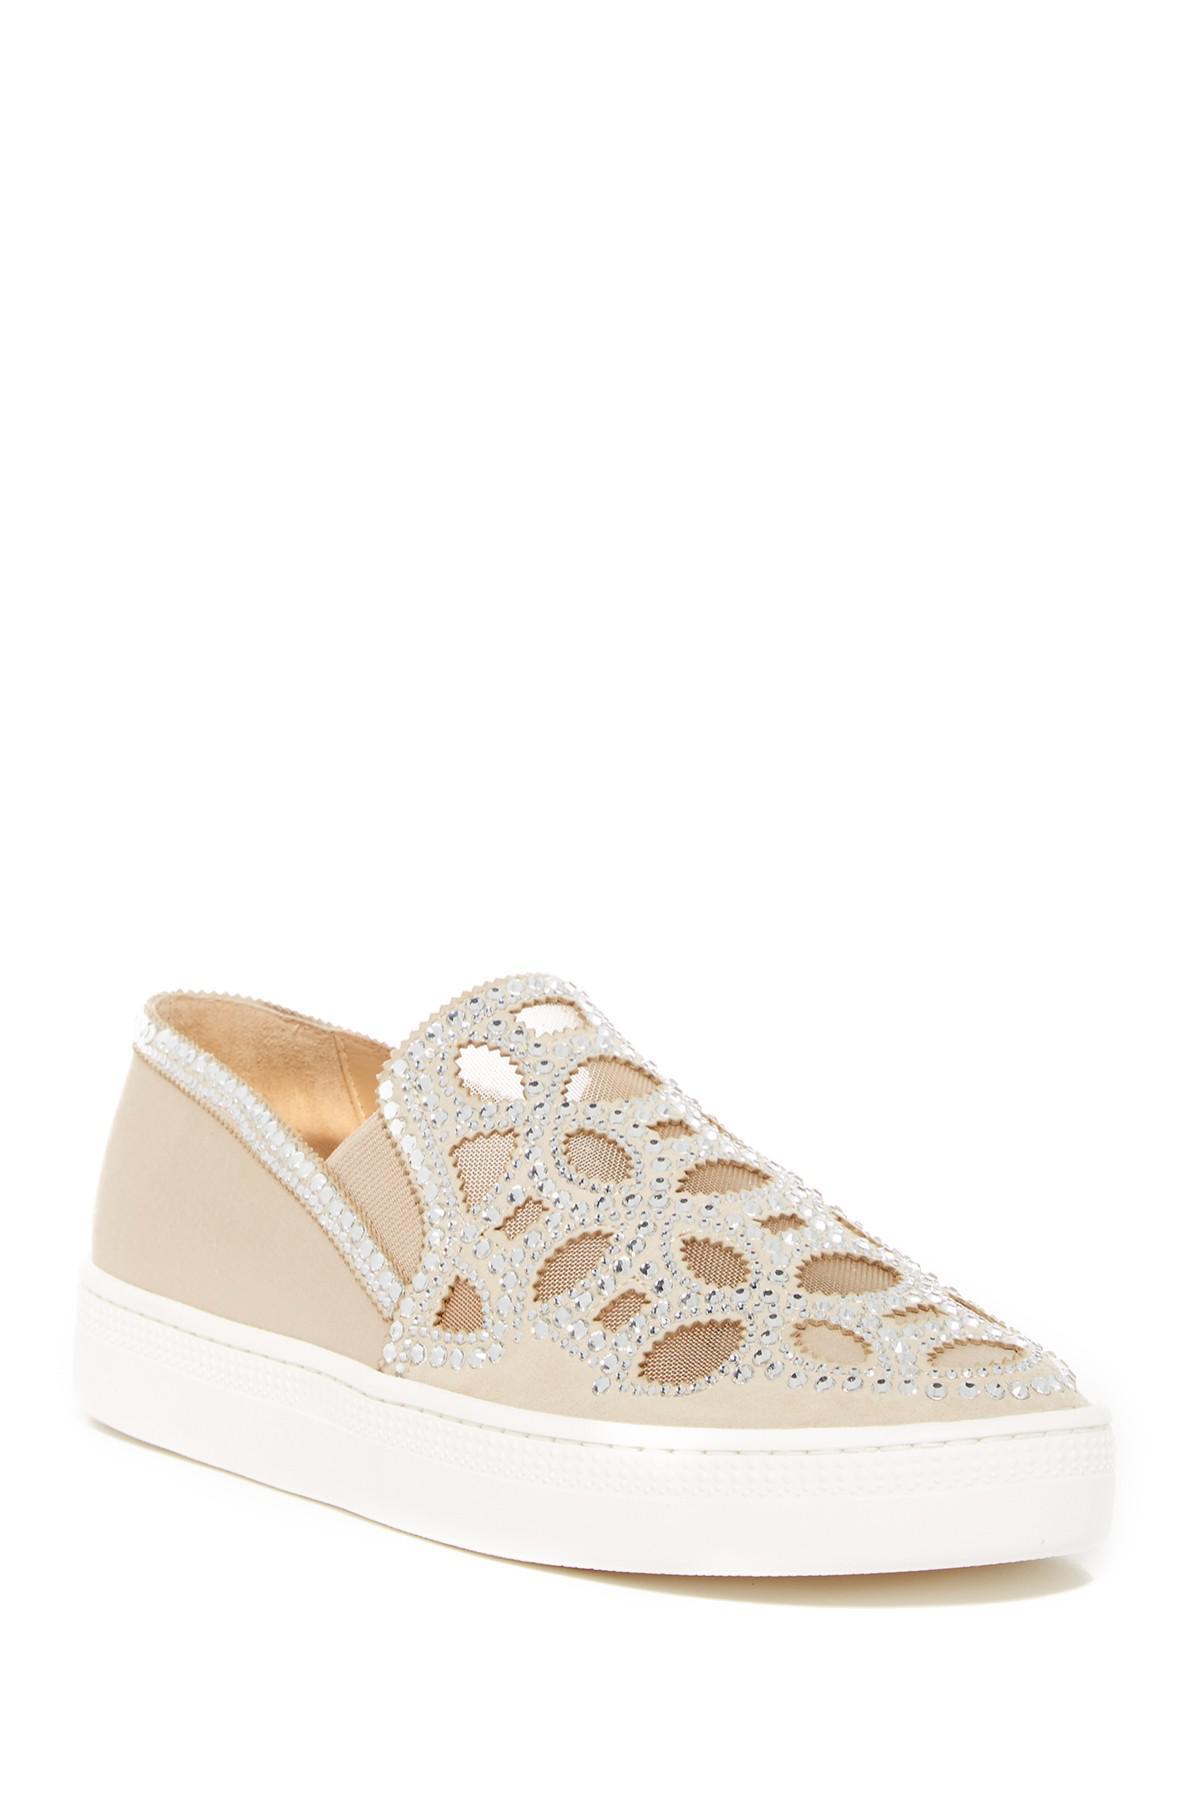 Badgley Mischka Shani Embellished Satin Slip-On Sneaker cwqgsEvHT